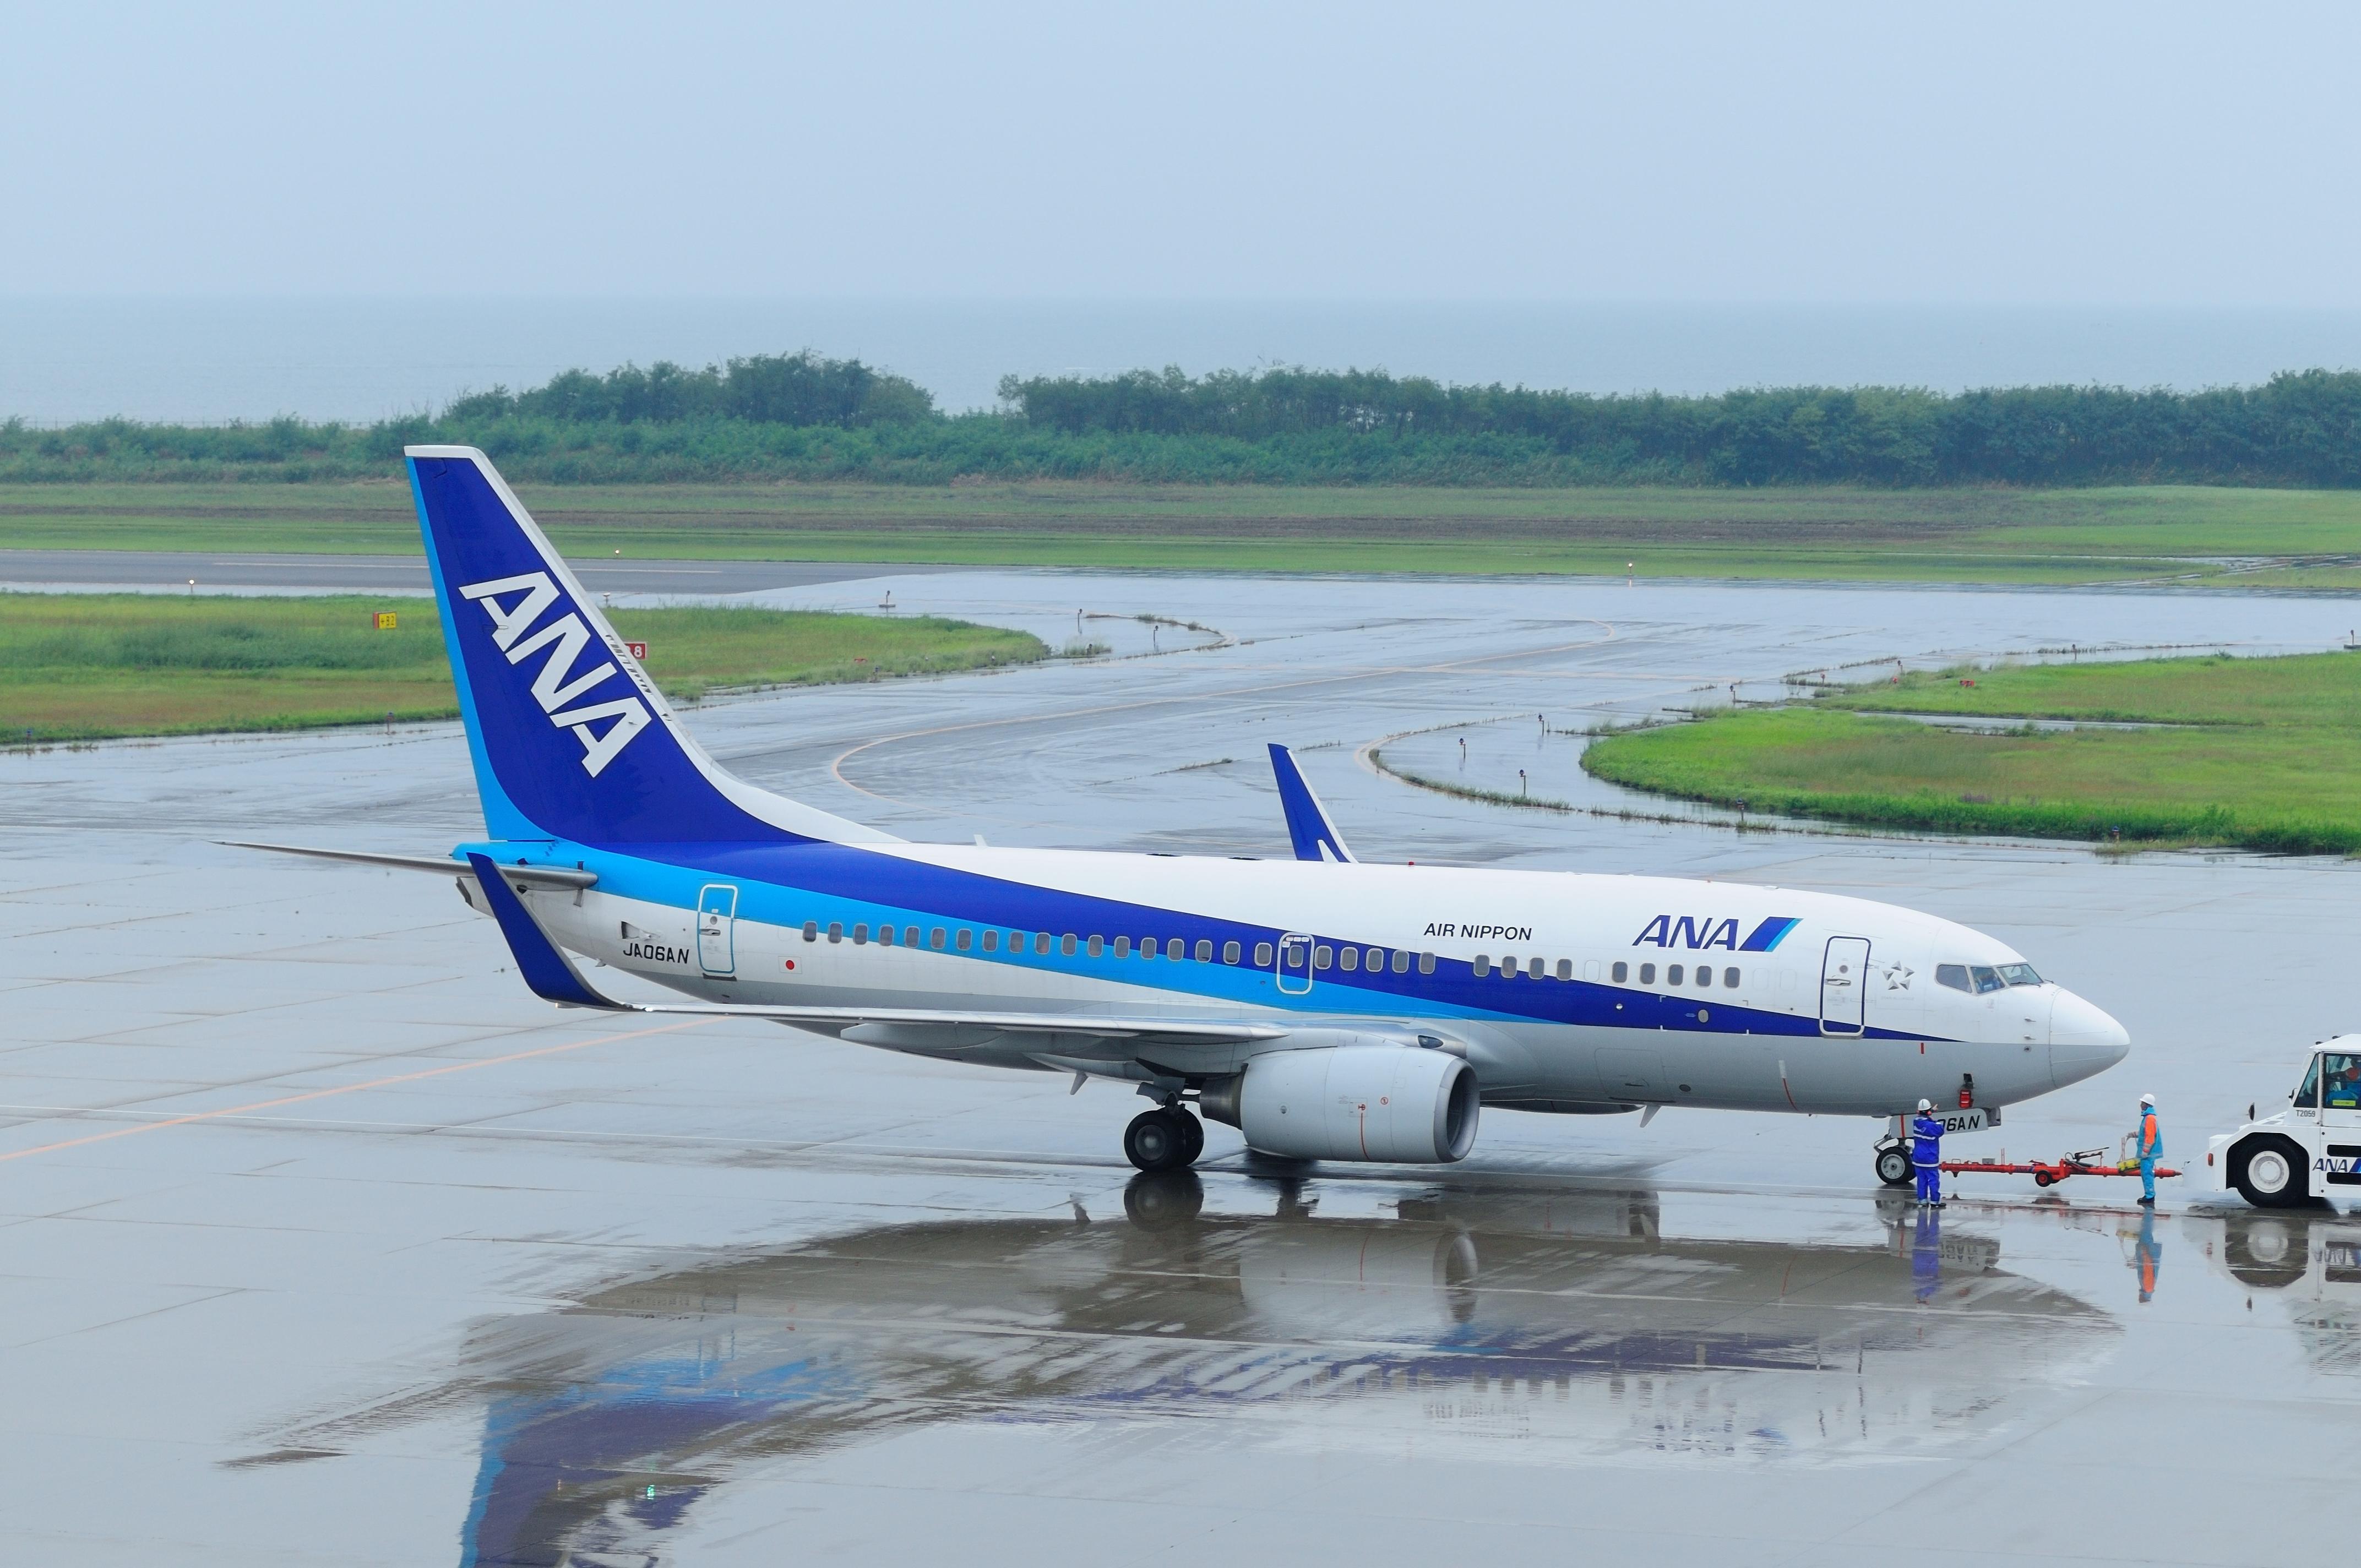 file air nippon boeing 737 781 winglets ja06an 33876 1992 rh commons wikimedia org